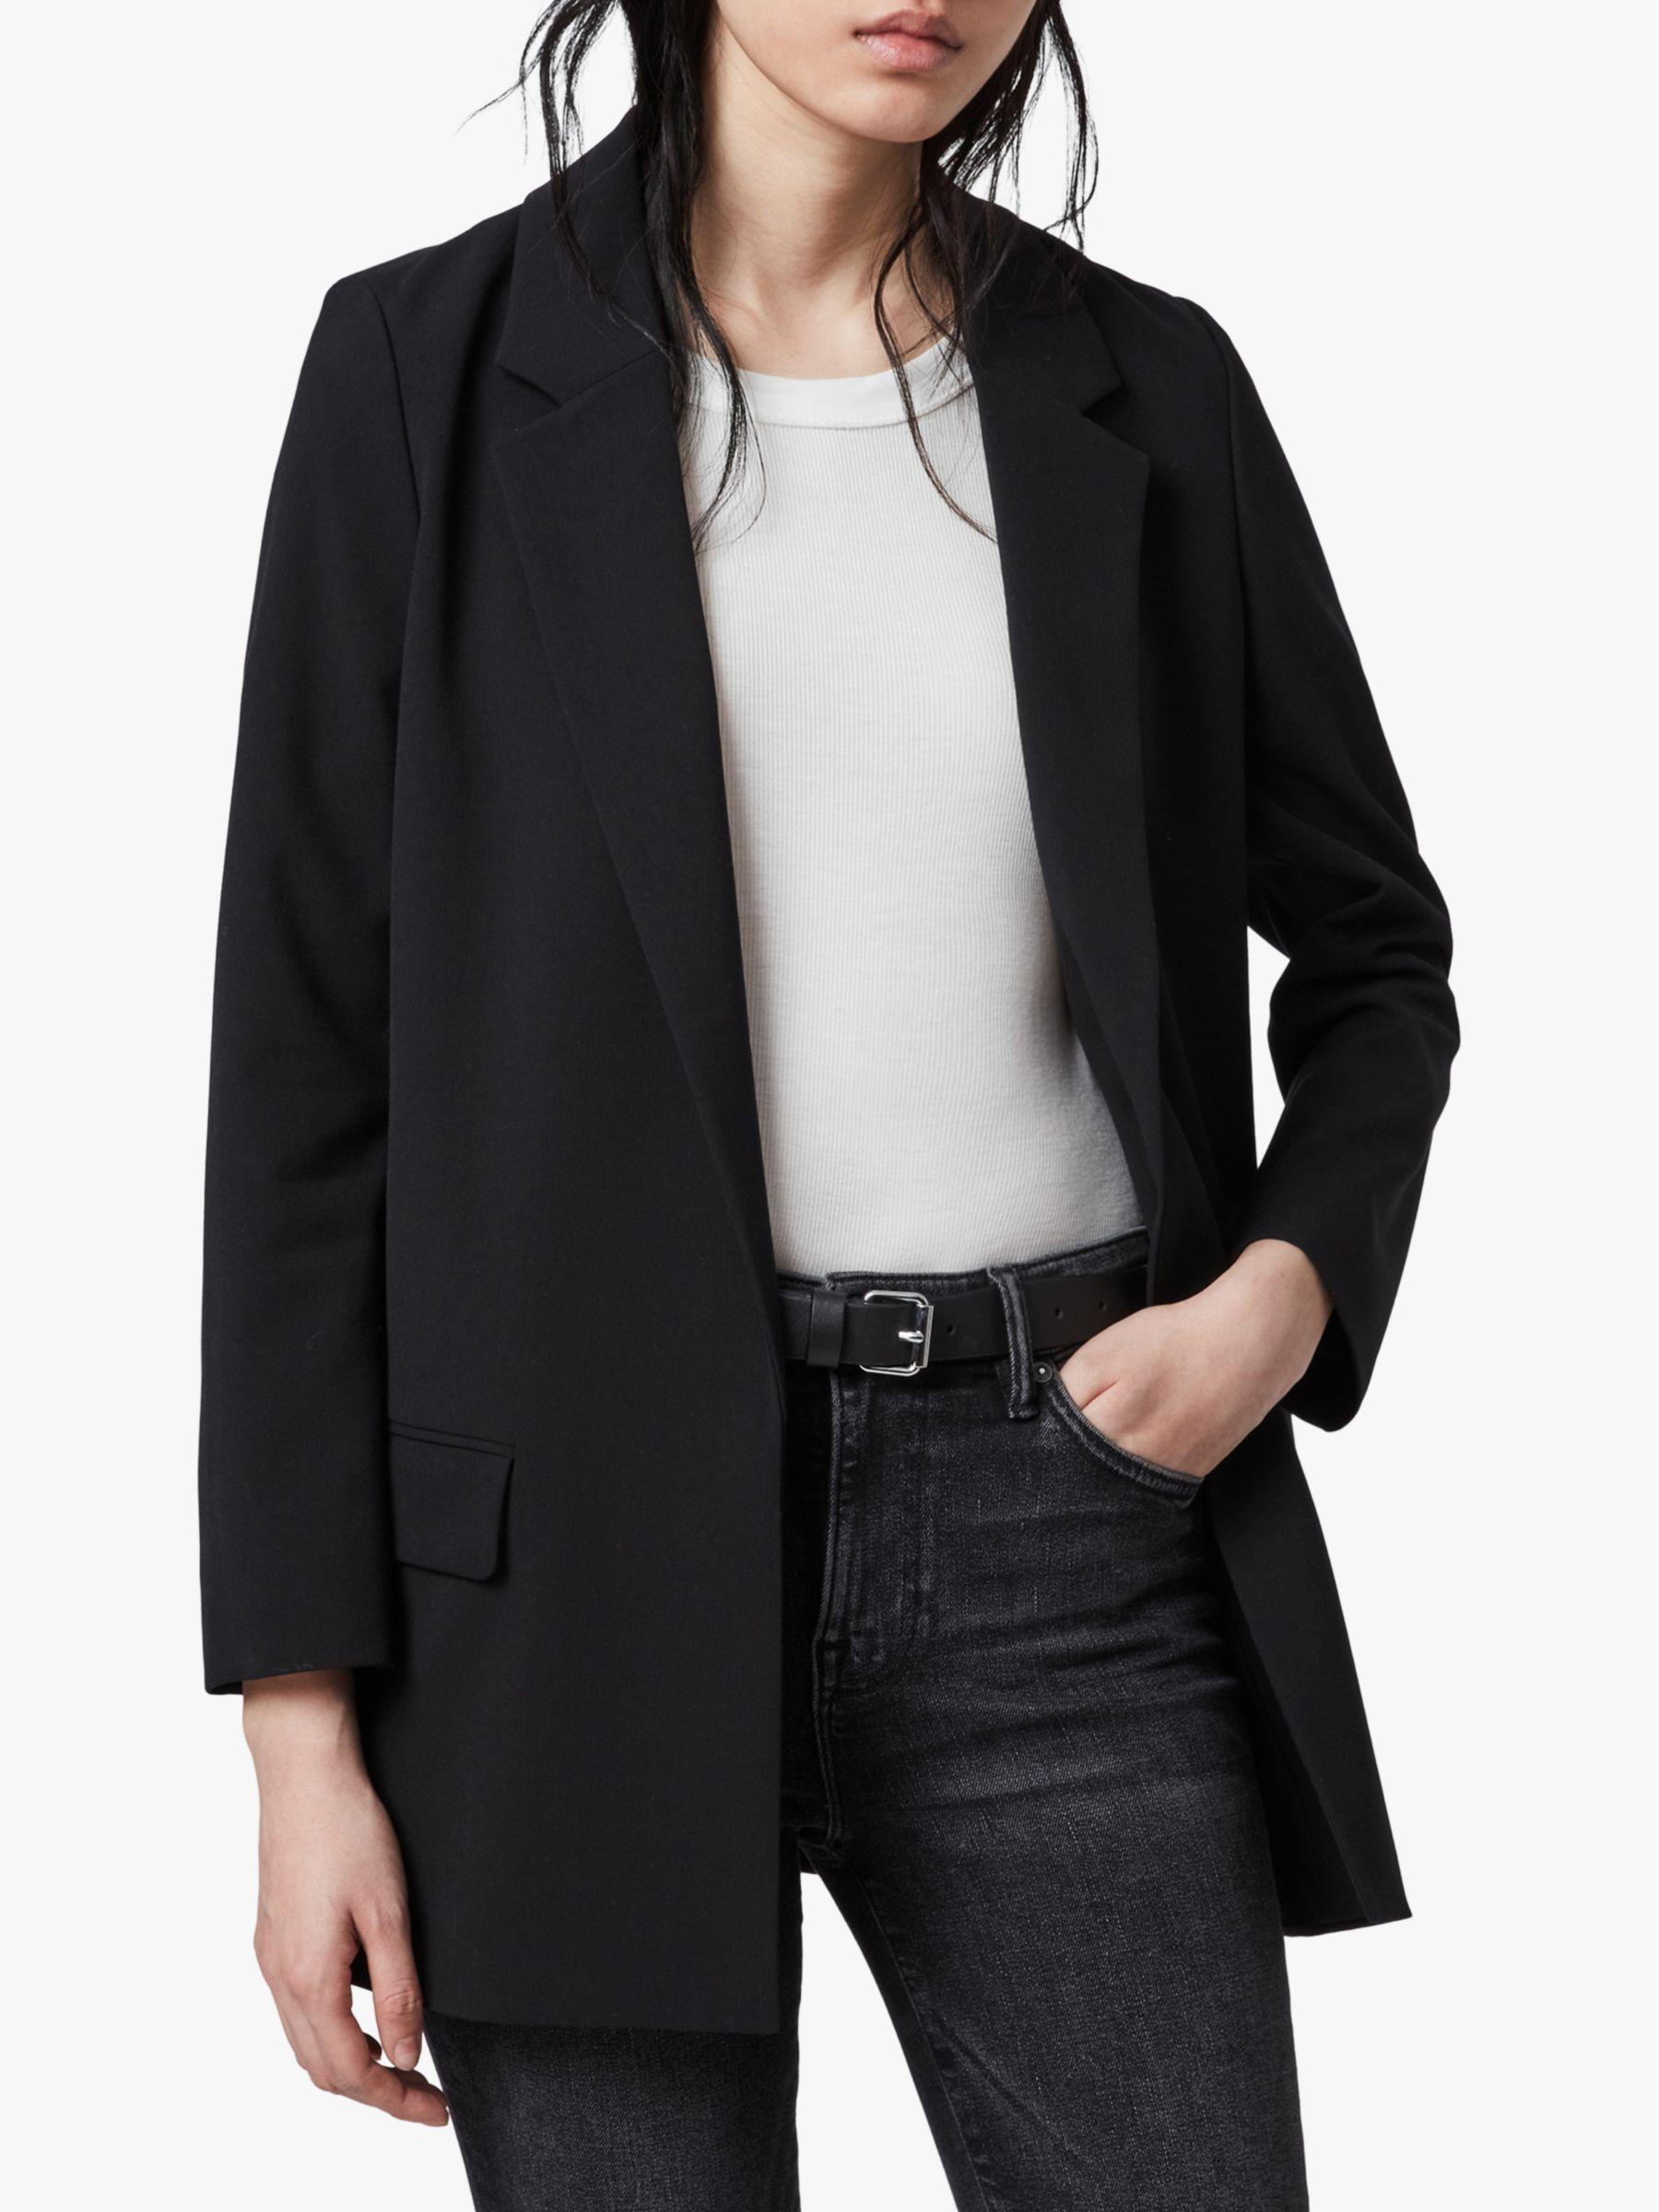 AllSaints AllSaints Aleidatri Single Breasted Long Line Blazer, Black